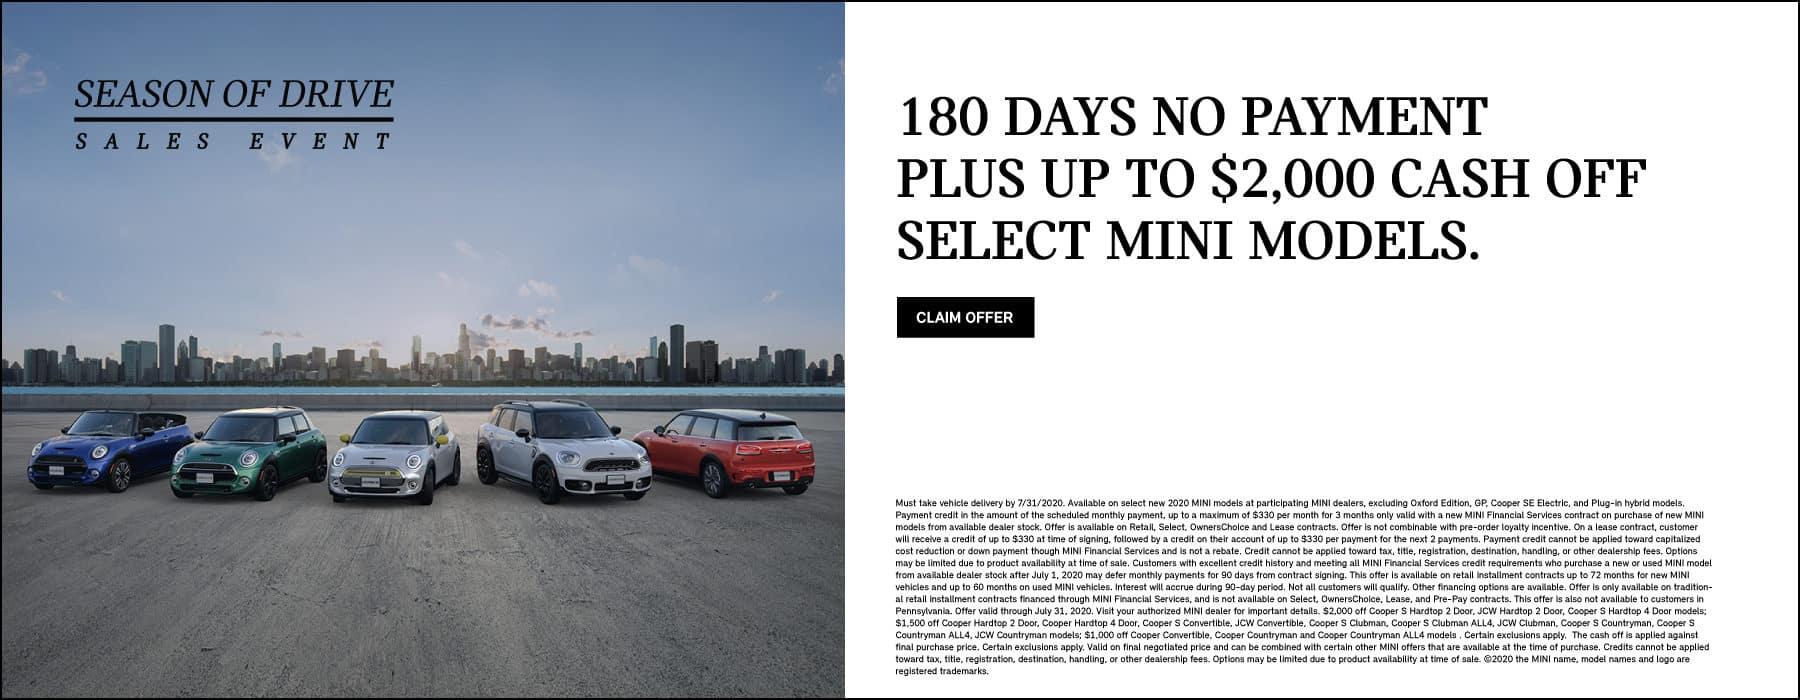 https://www.miniofdesmoines.com/new-vehicles/